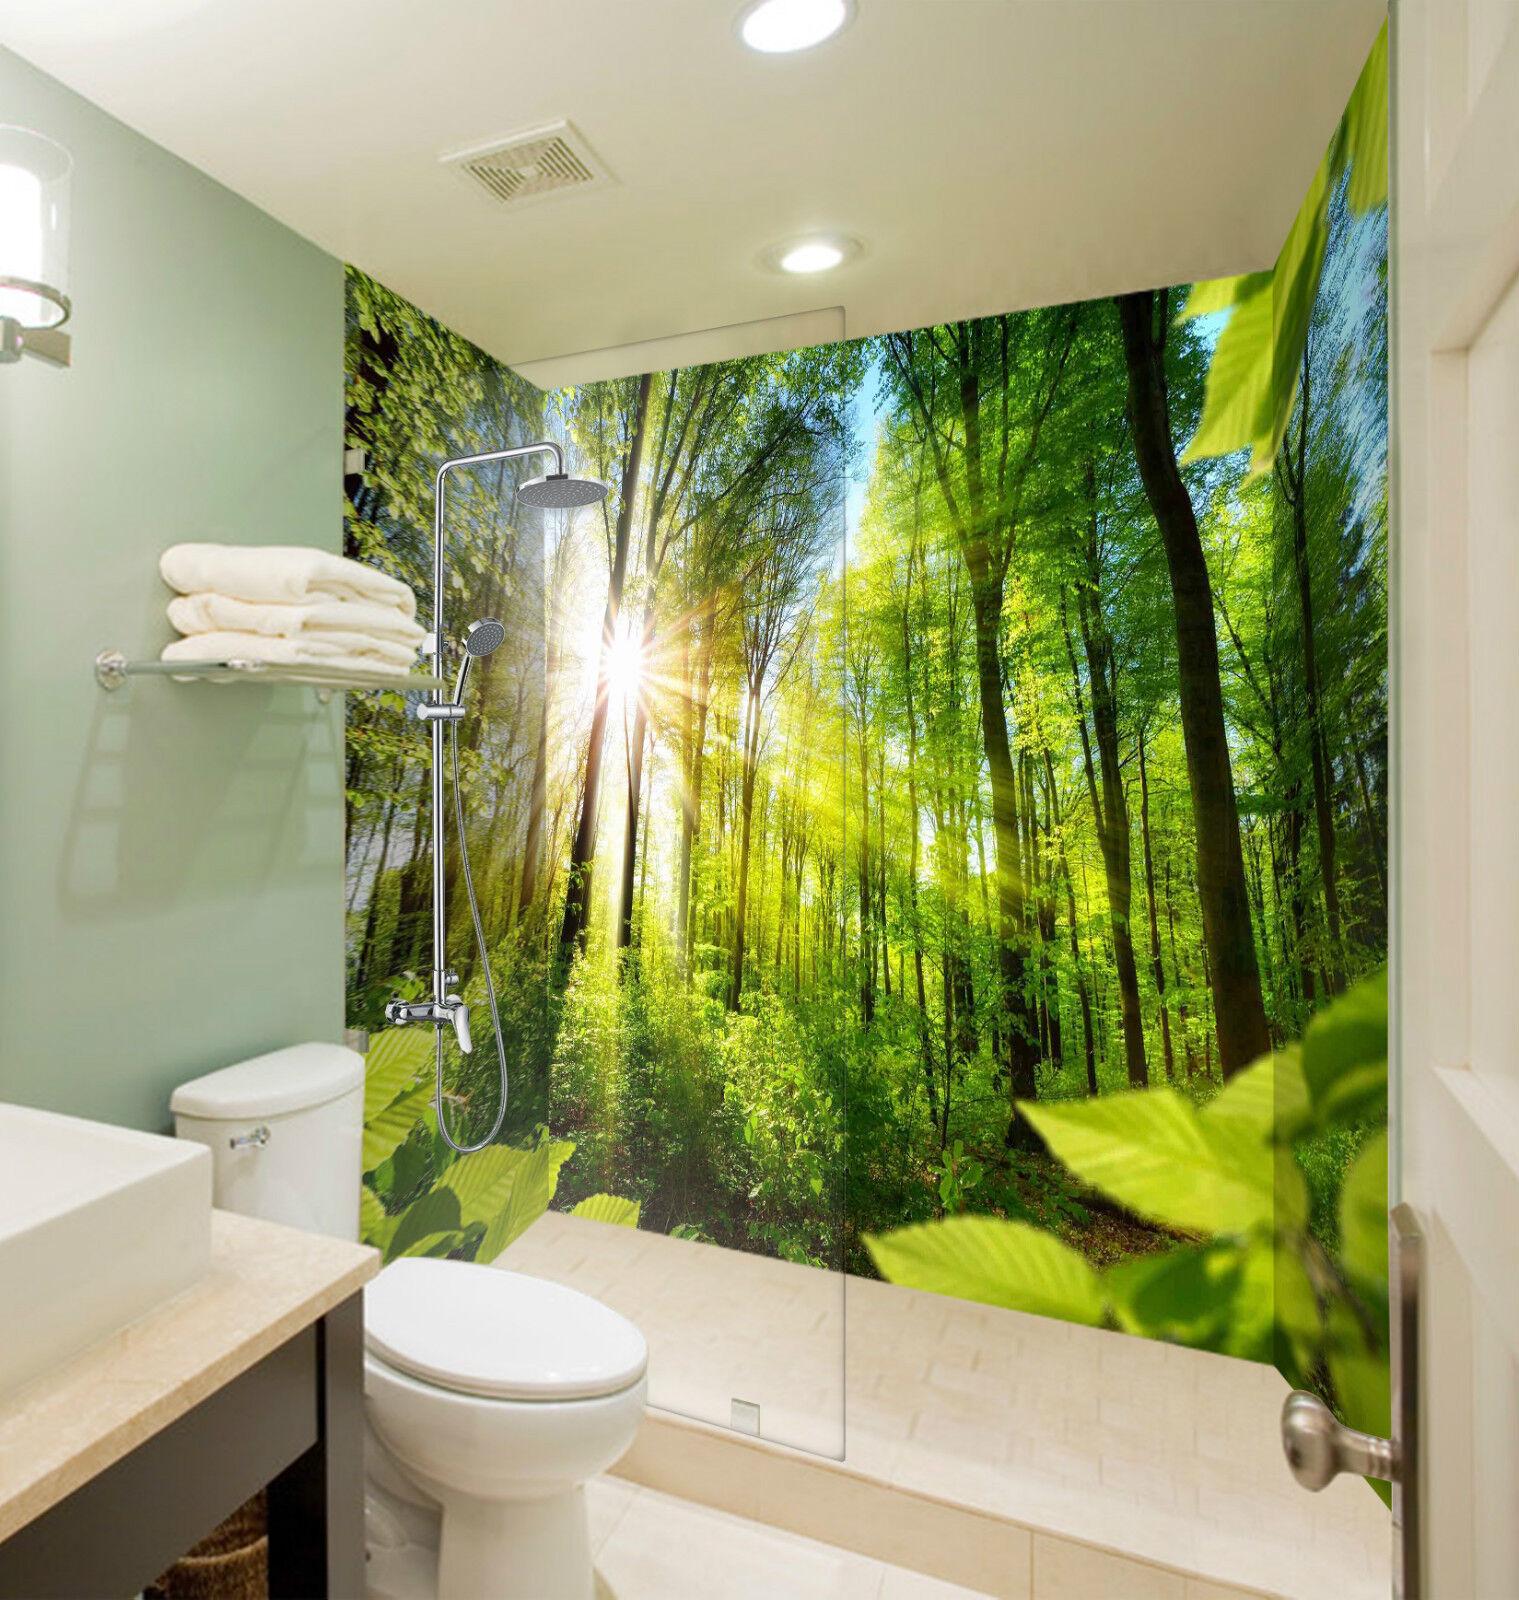 3D Forest Sunshine 0027 WallPaper Bathroom Print Decal Wall Deco AJ WALLPAPER CA